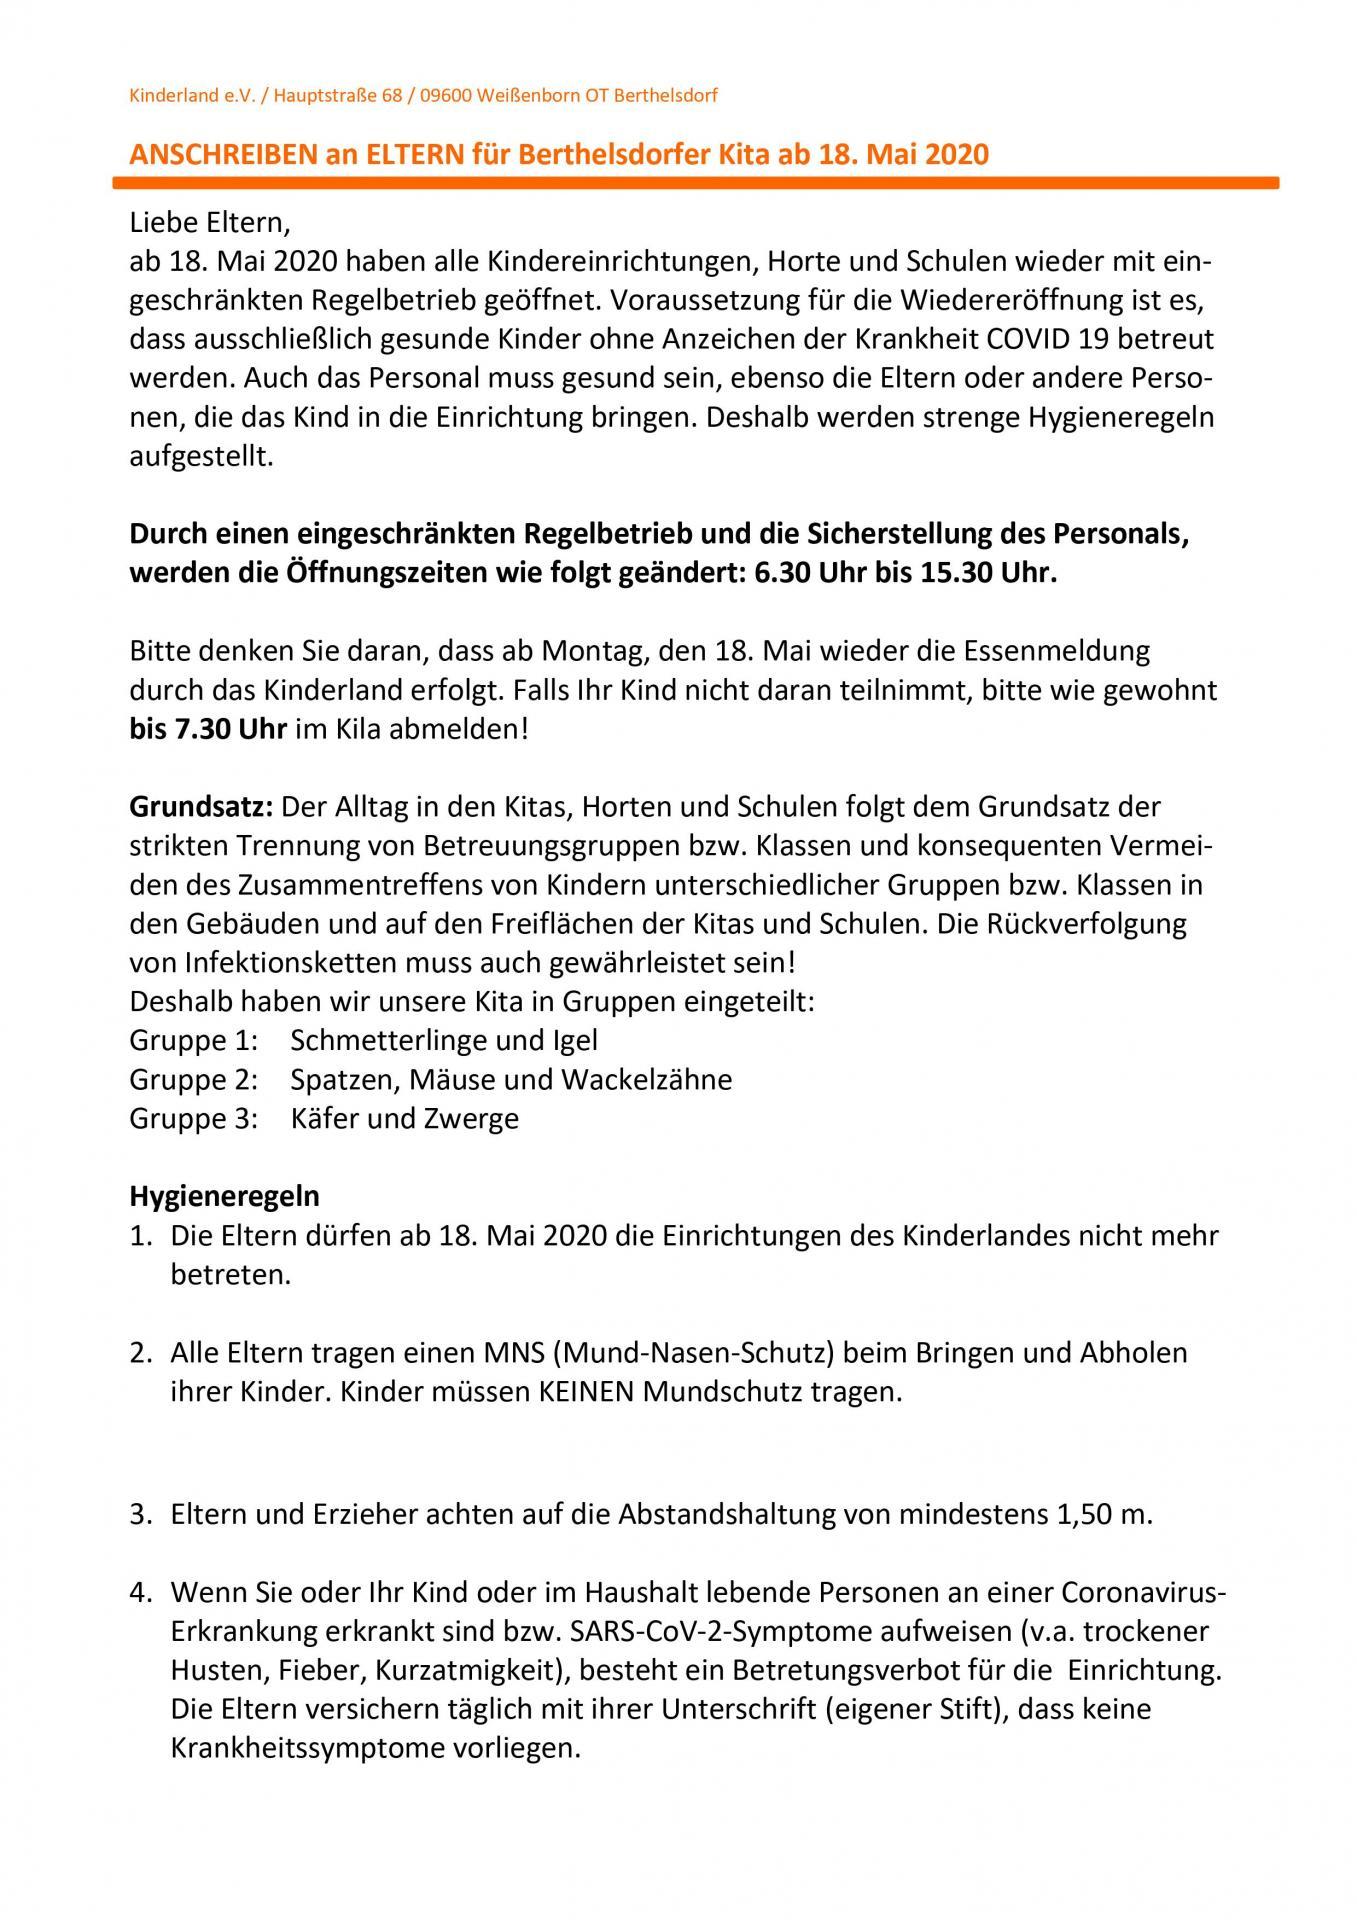 Berthelsdorf 2